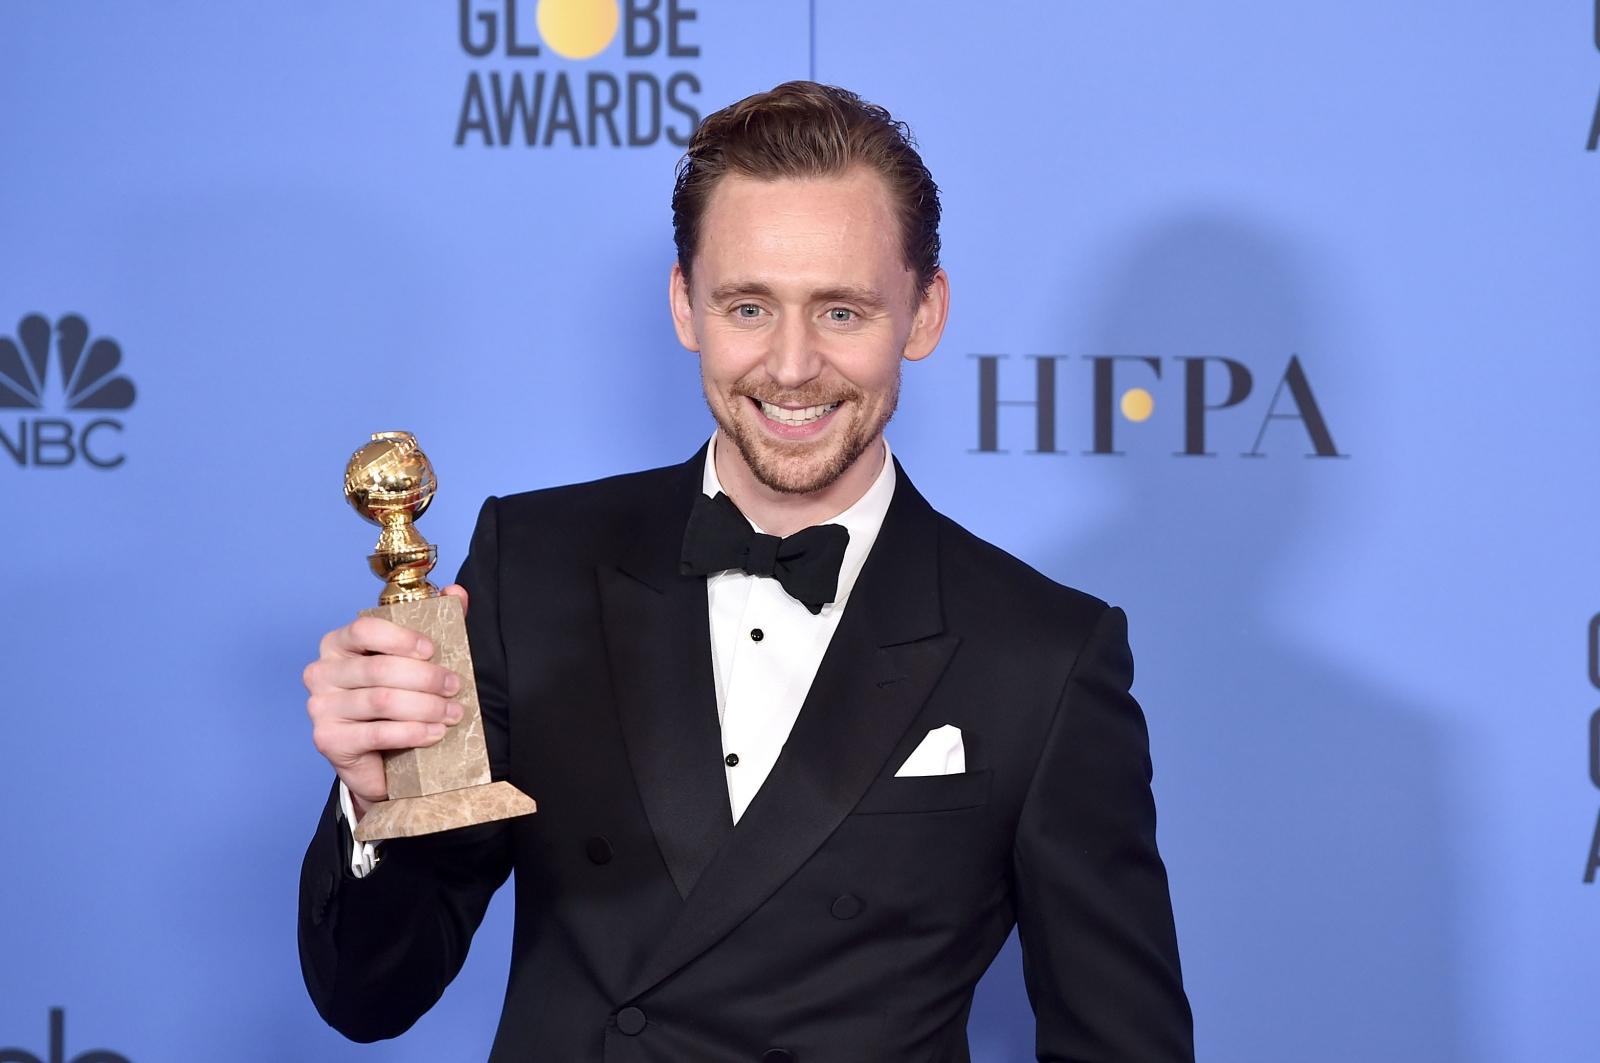 74th Annual Golden Globe Awards